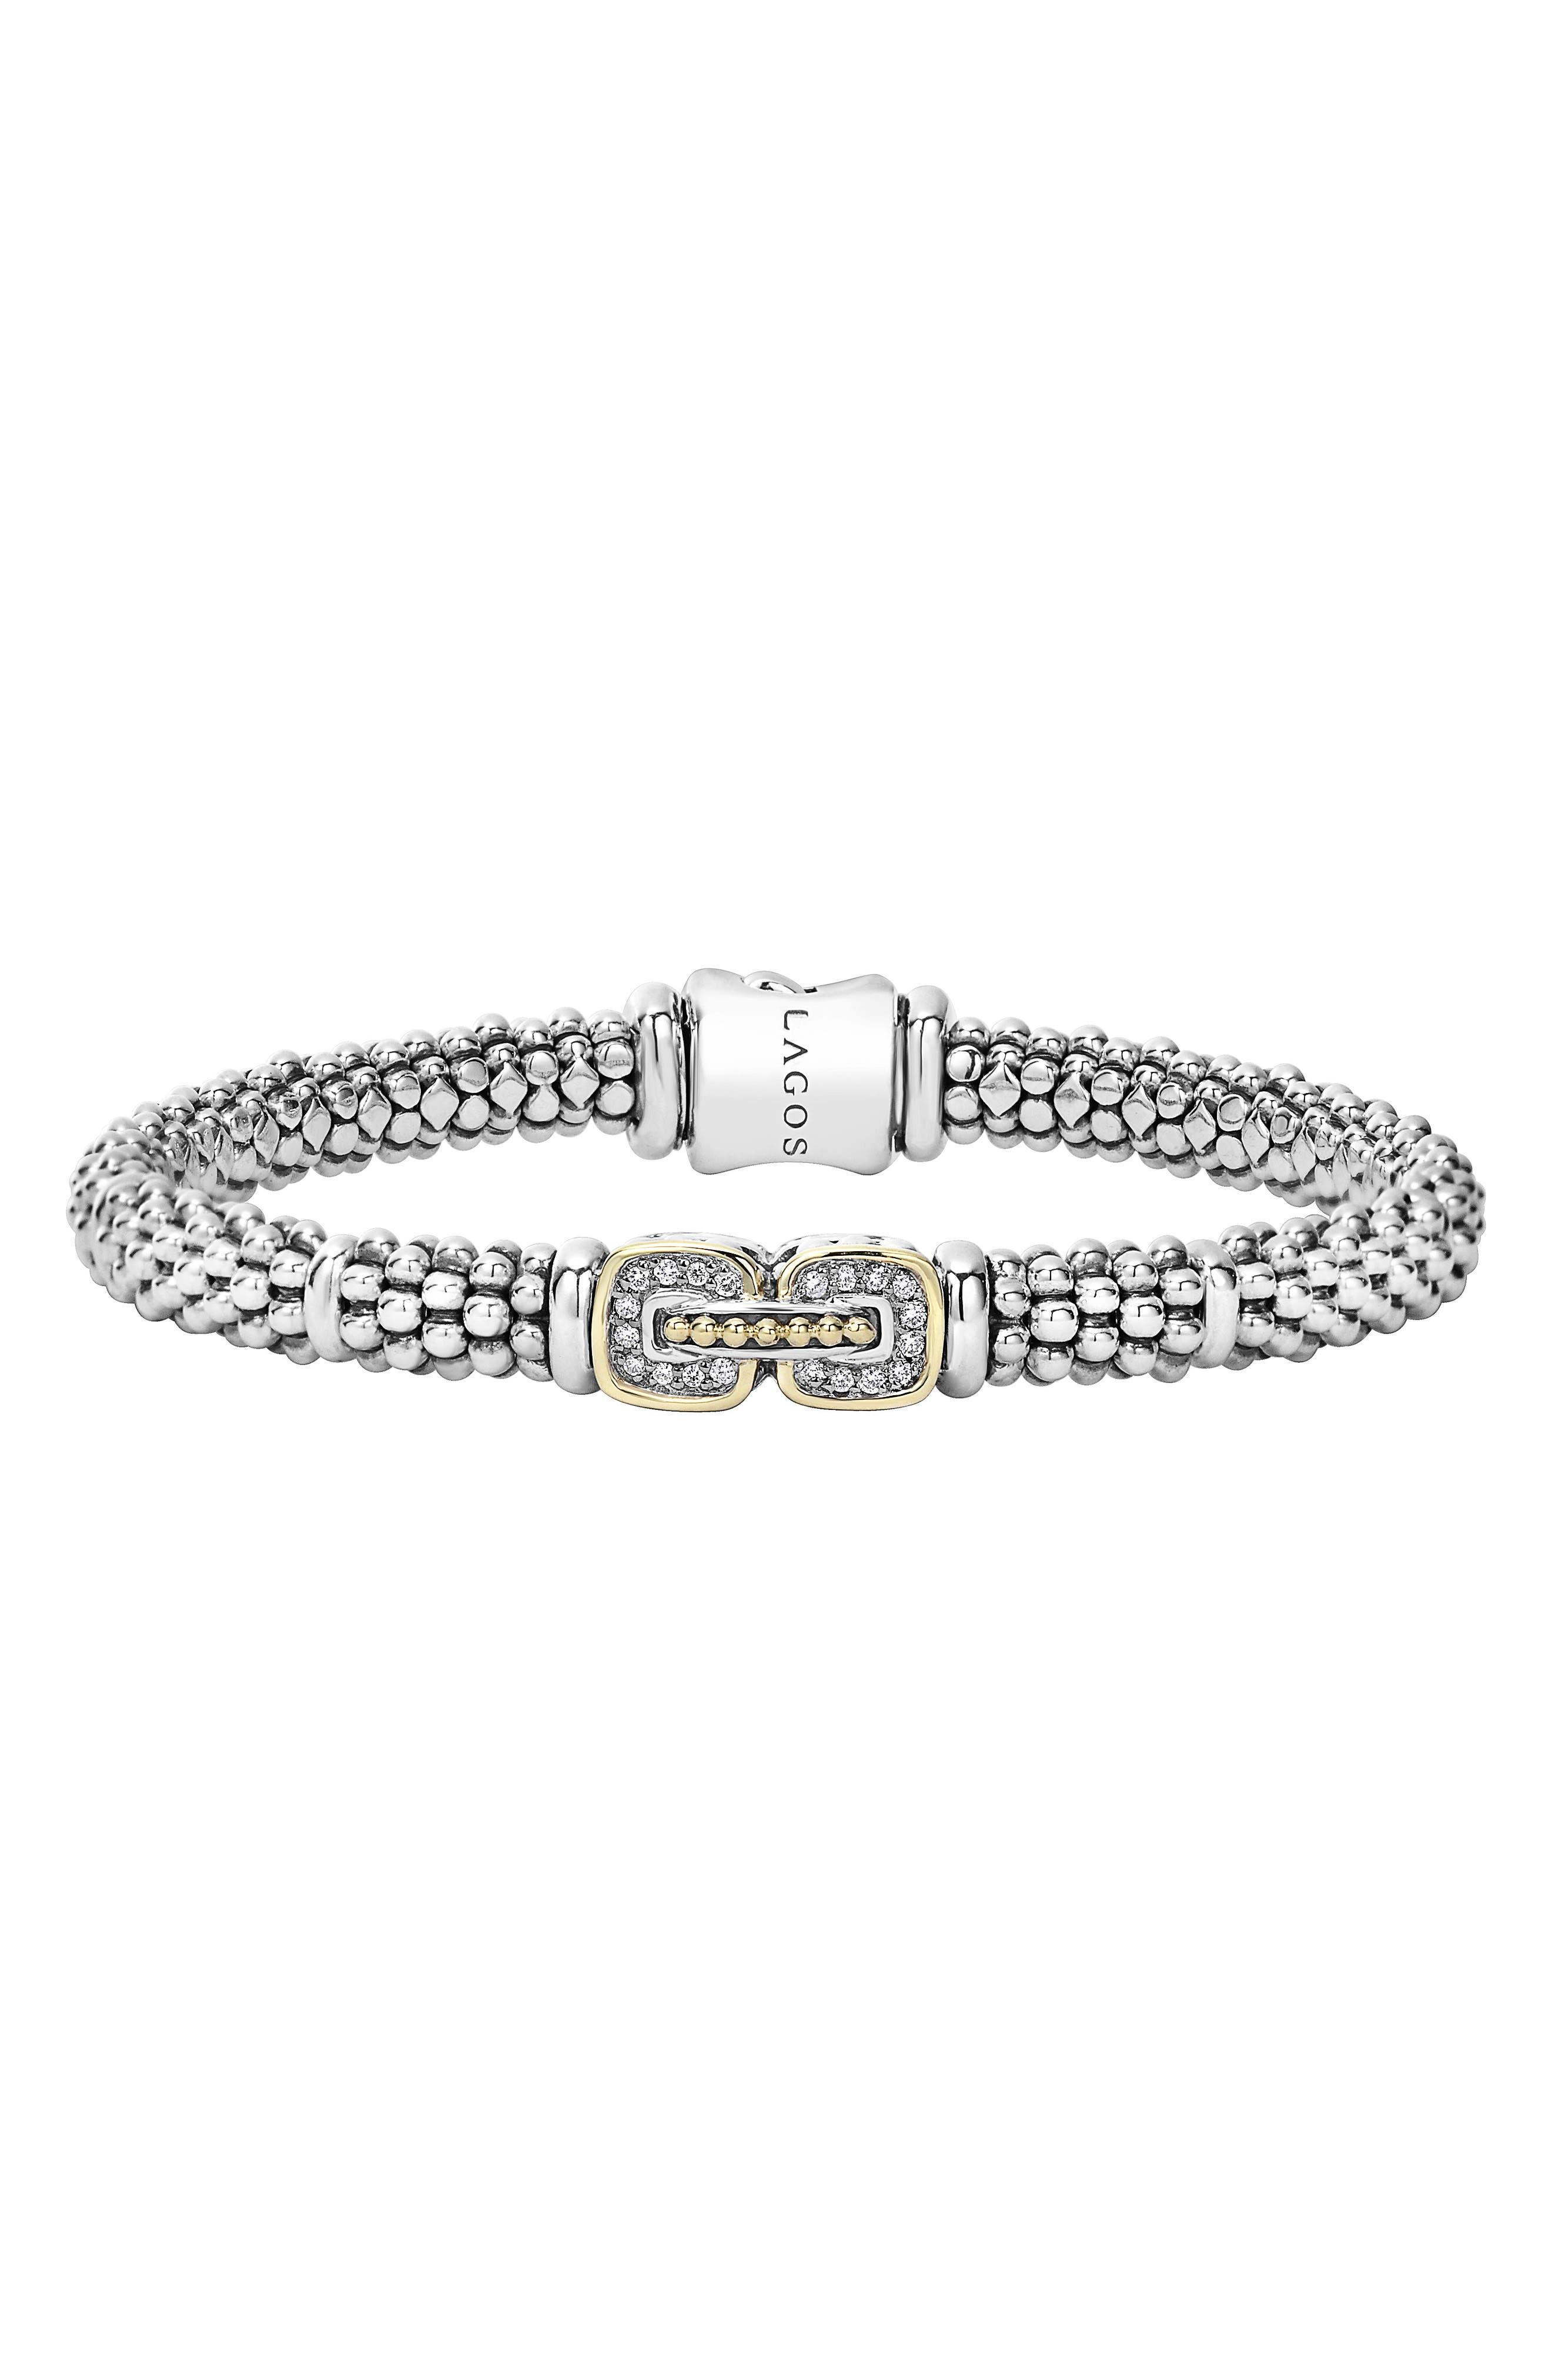 Caviar Cushion Diamond Station Bracelet,                             Main thumbnail 1, color,                             SILVER/ GOLD